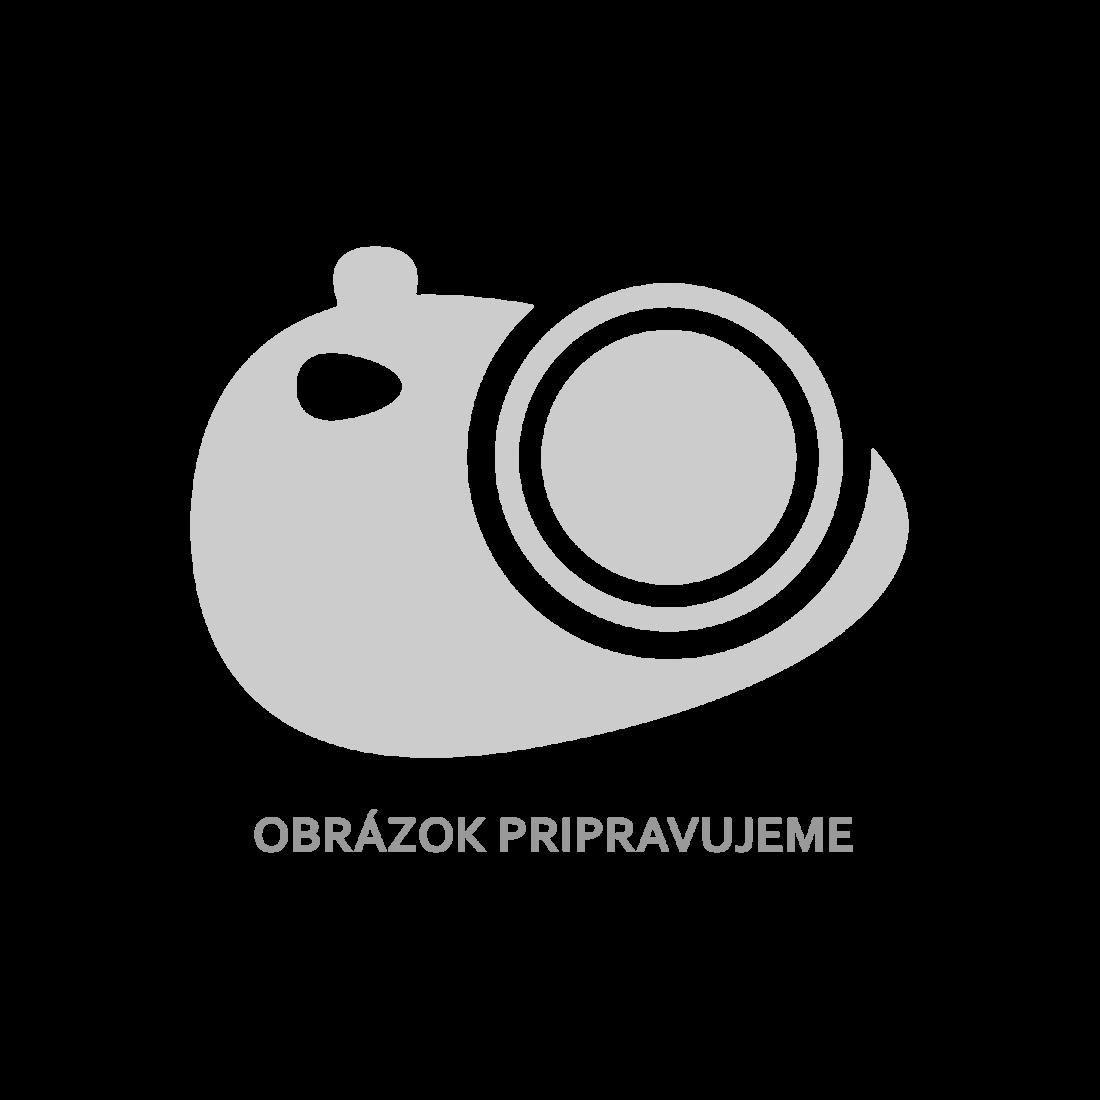 Ženská krajčírska figurína plátno s pruhmi